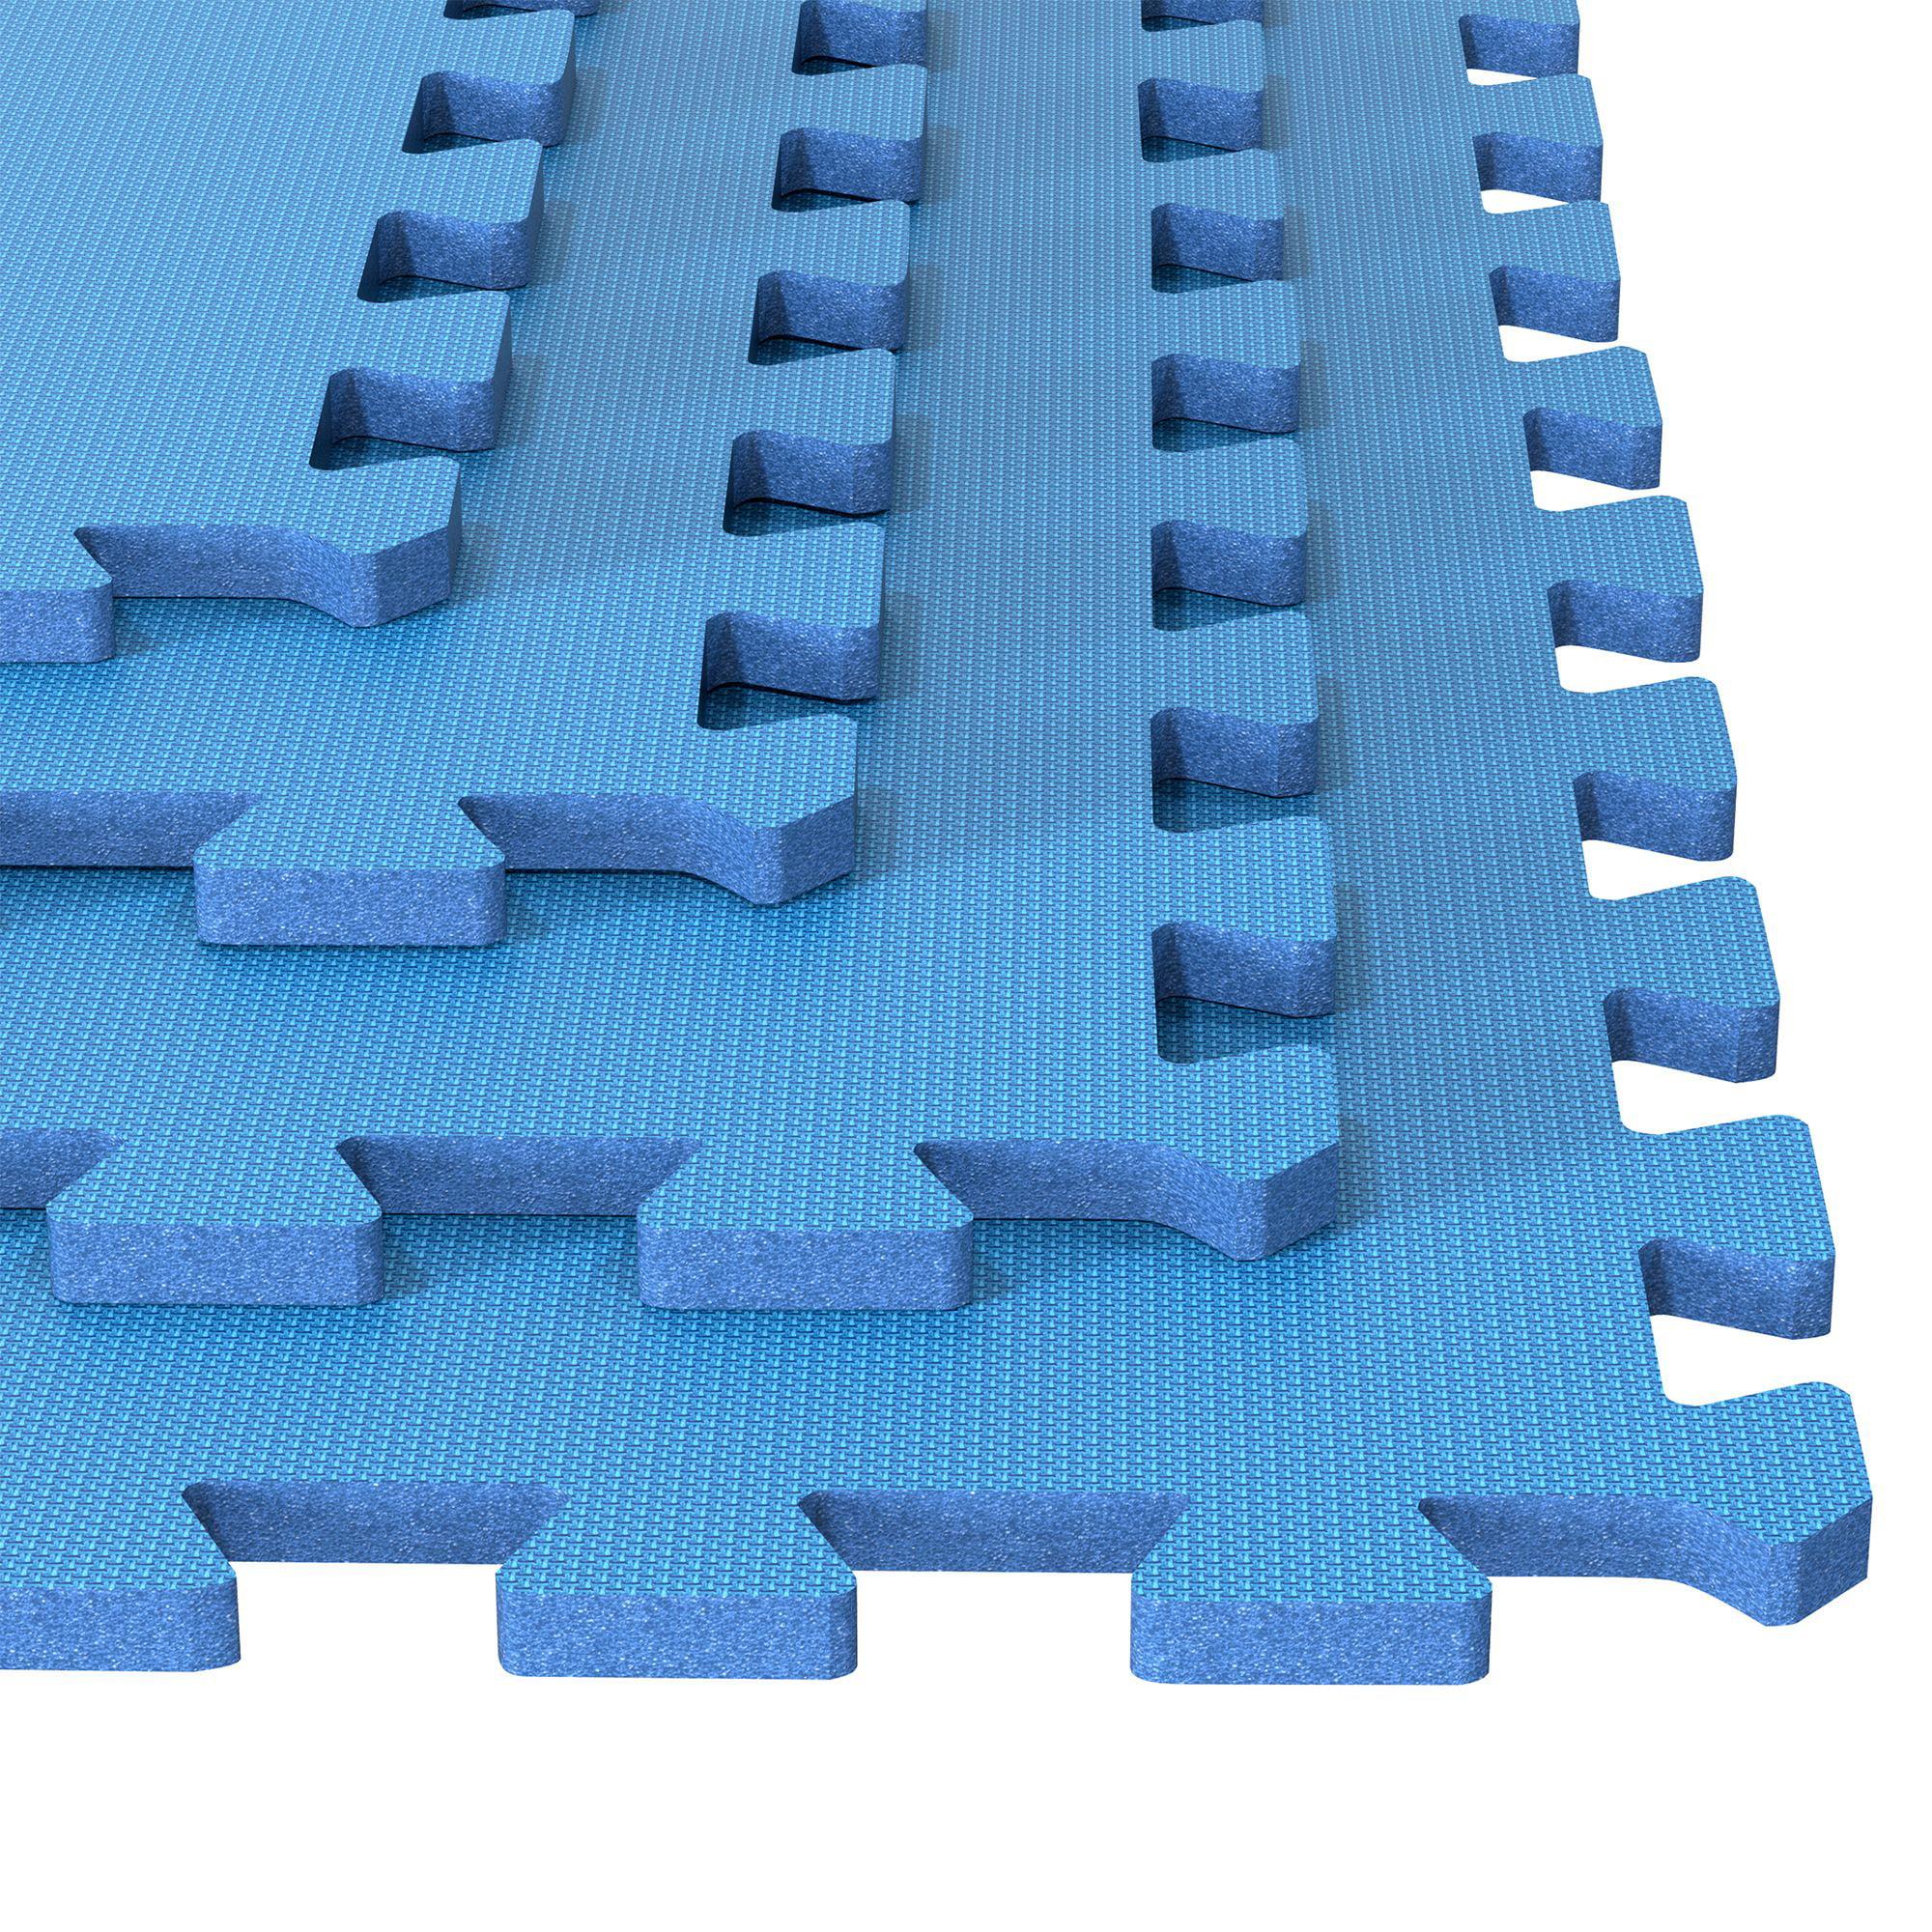 Foam Mat Floor Tiles Interlocking Ultimate Comfort Eva Padding Stalwart Soft Flooring